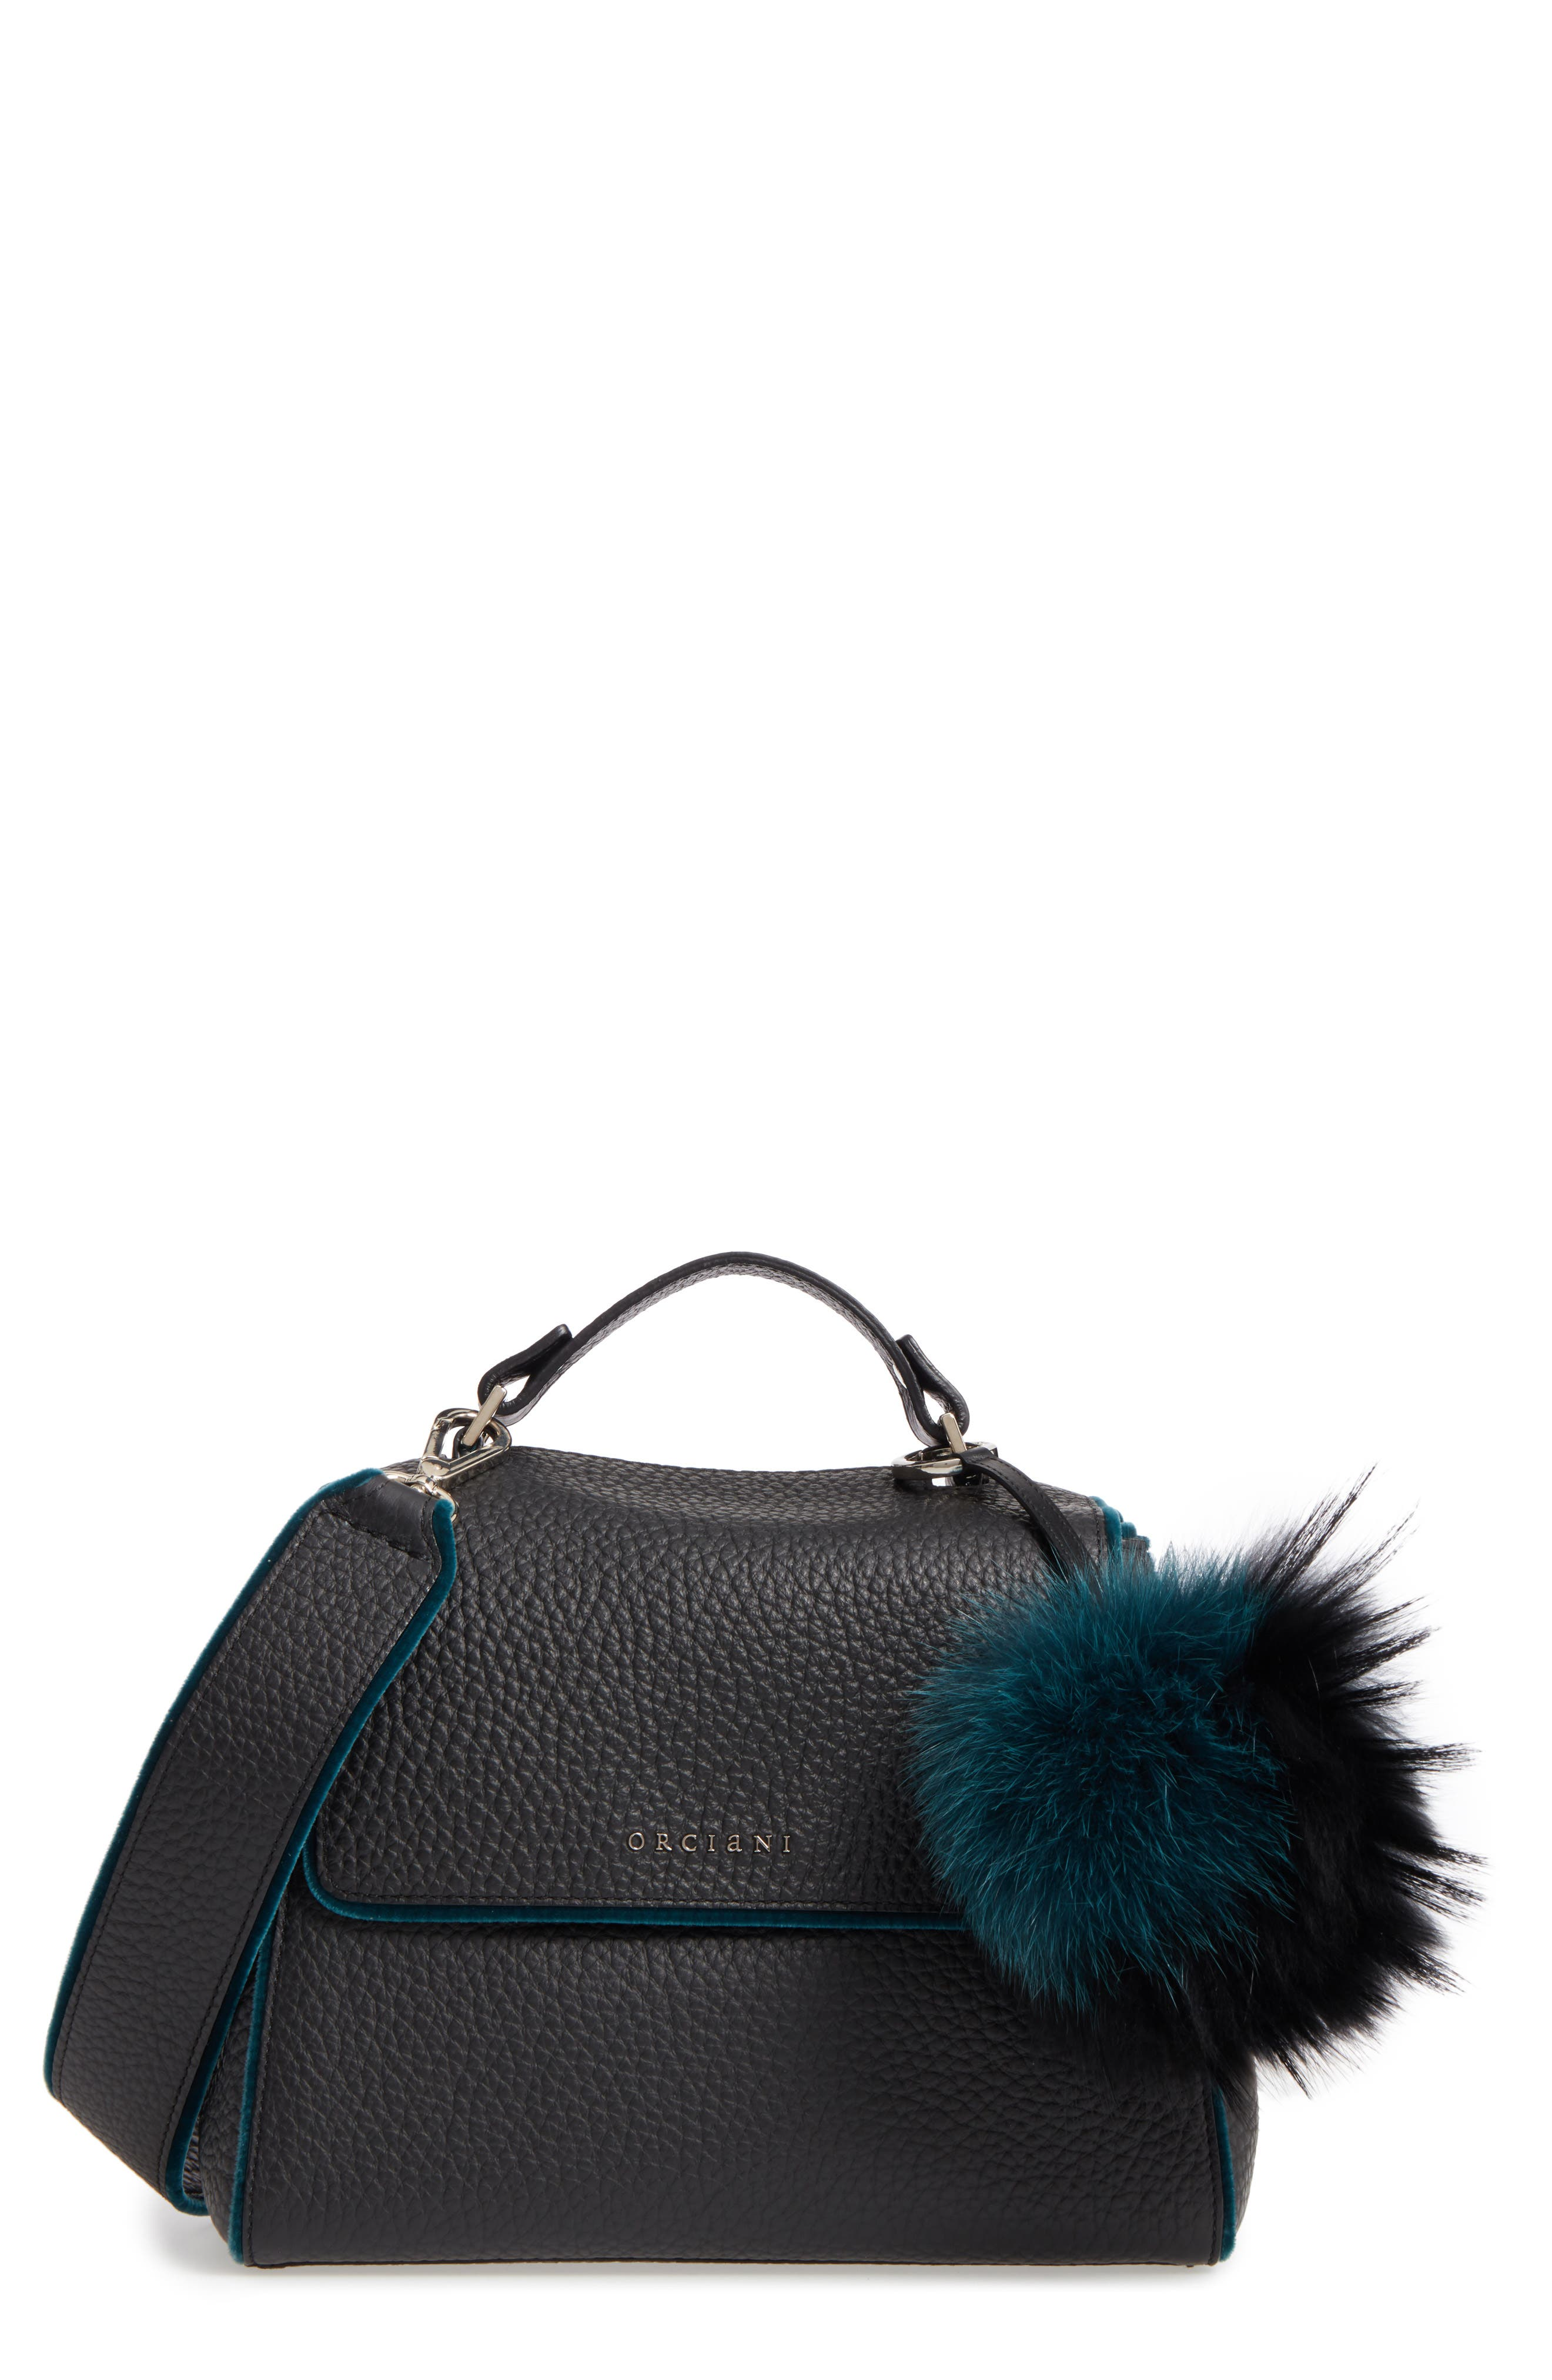 ORCIANI Small Sveva Soft Leather Top Handle Satchel with Genuine Fur Bag Charm